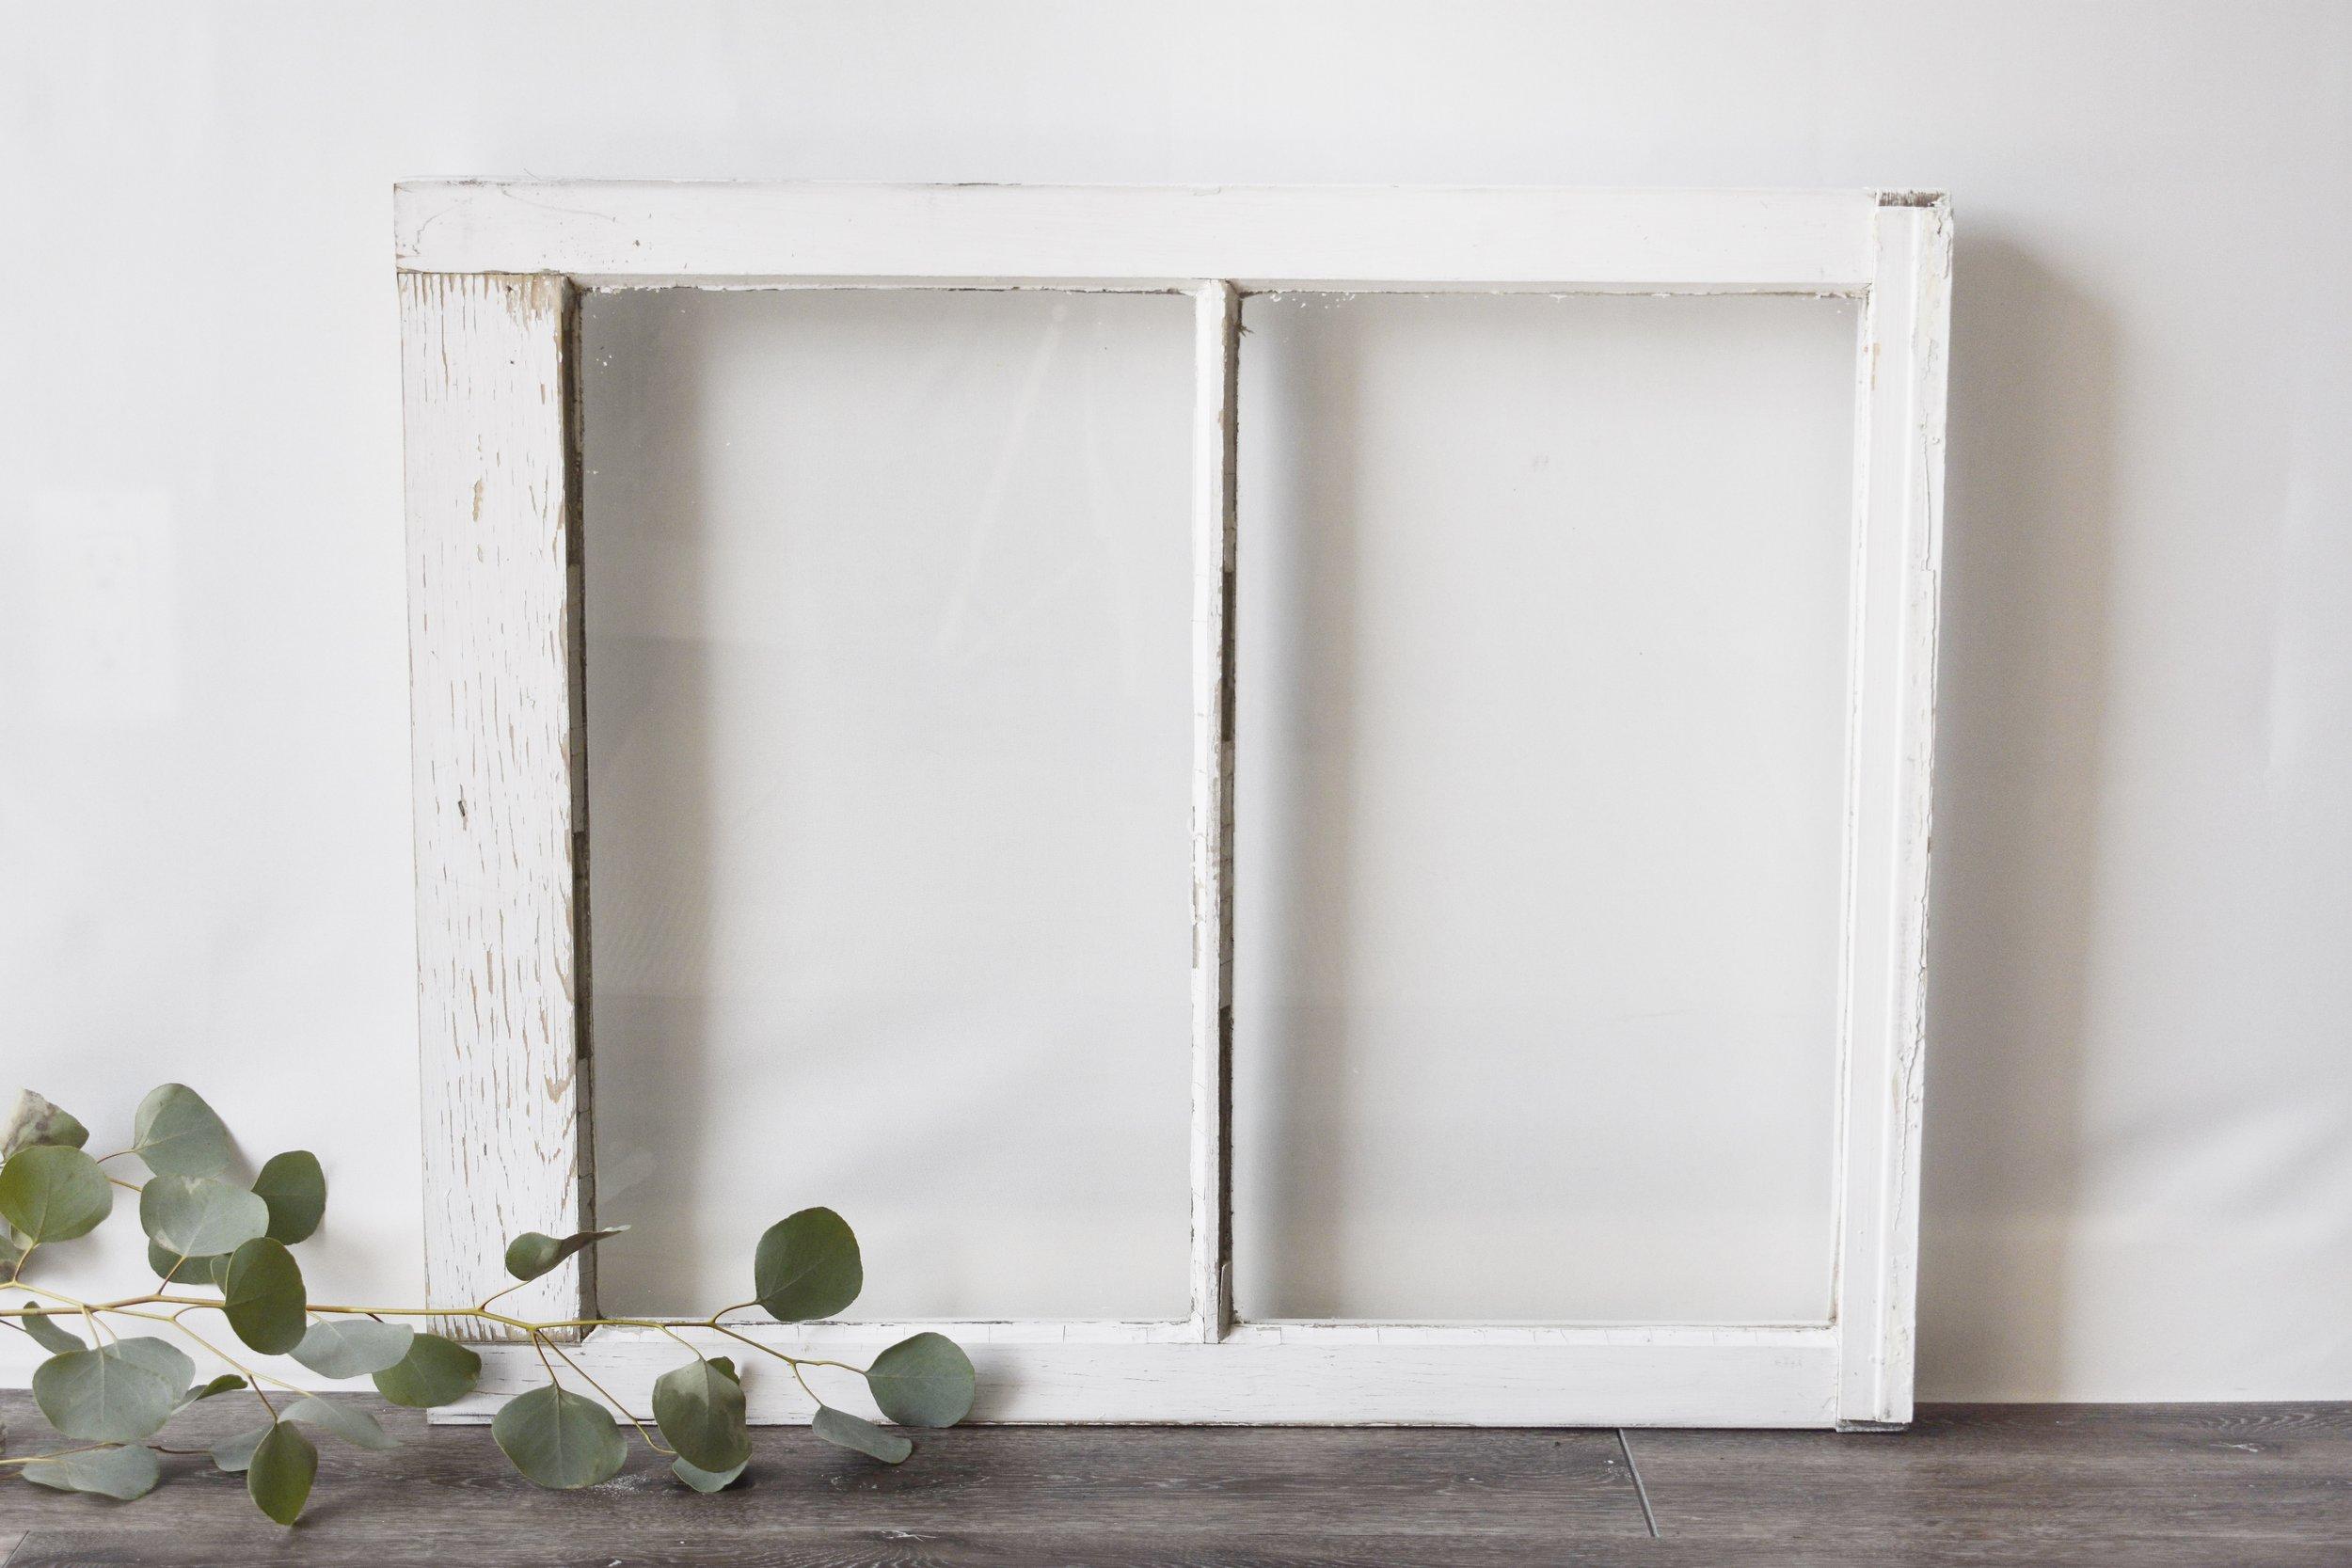 Distressed White Windows